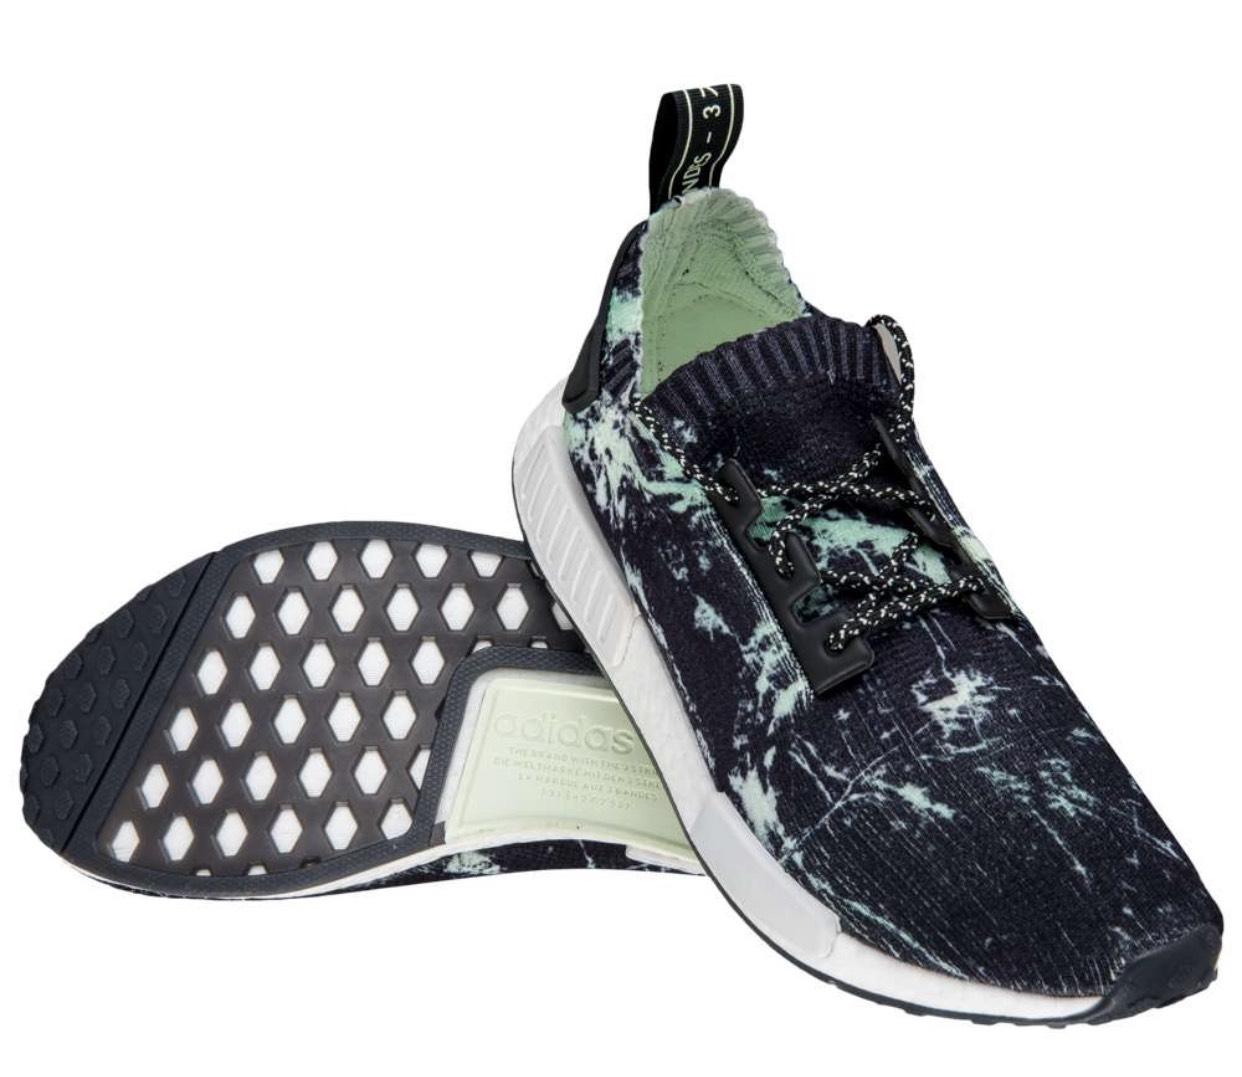 adidas Originals NMD_R1 Primeknit Boost Sneaker